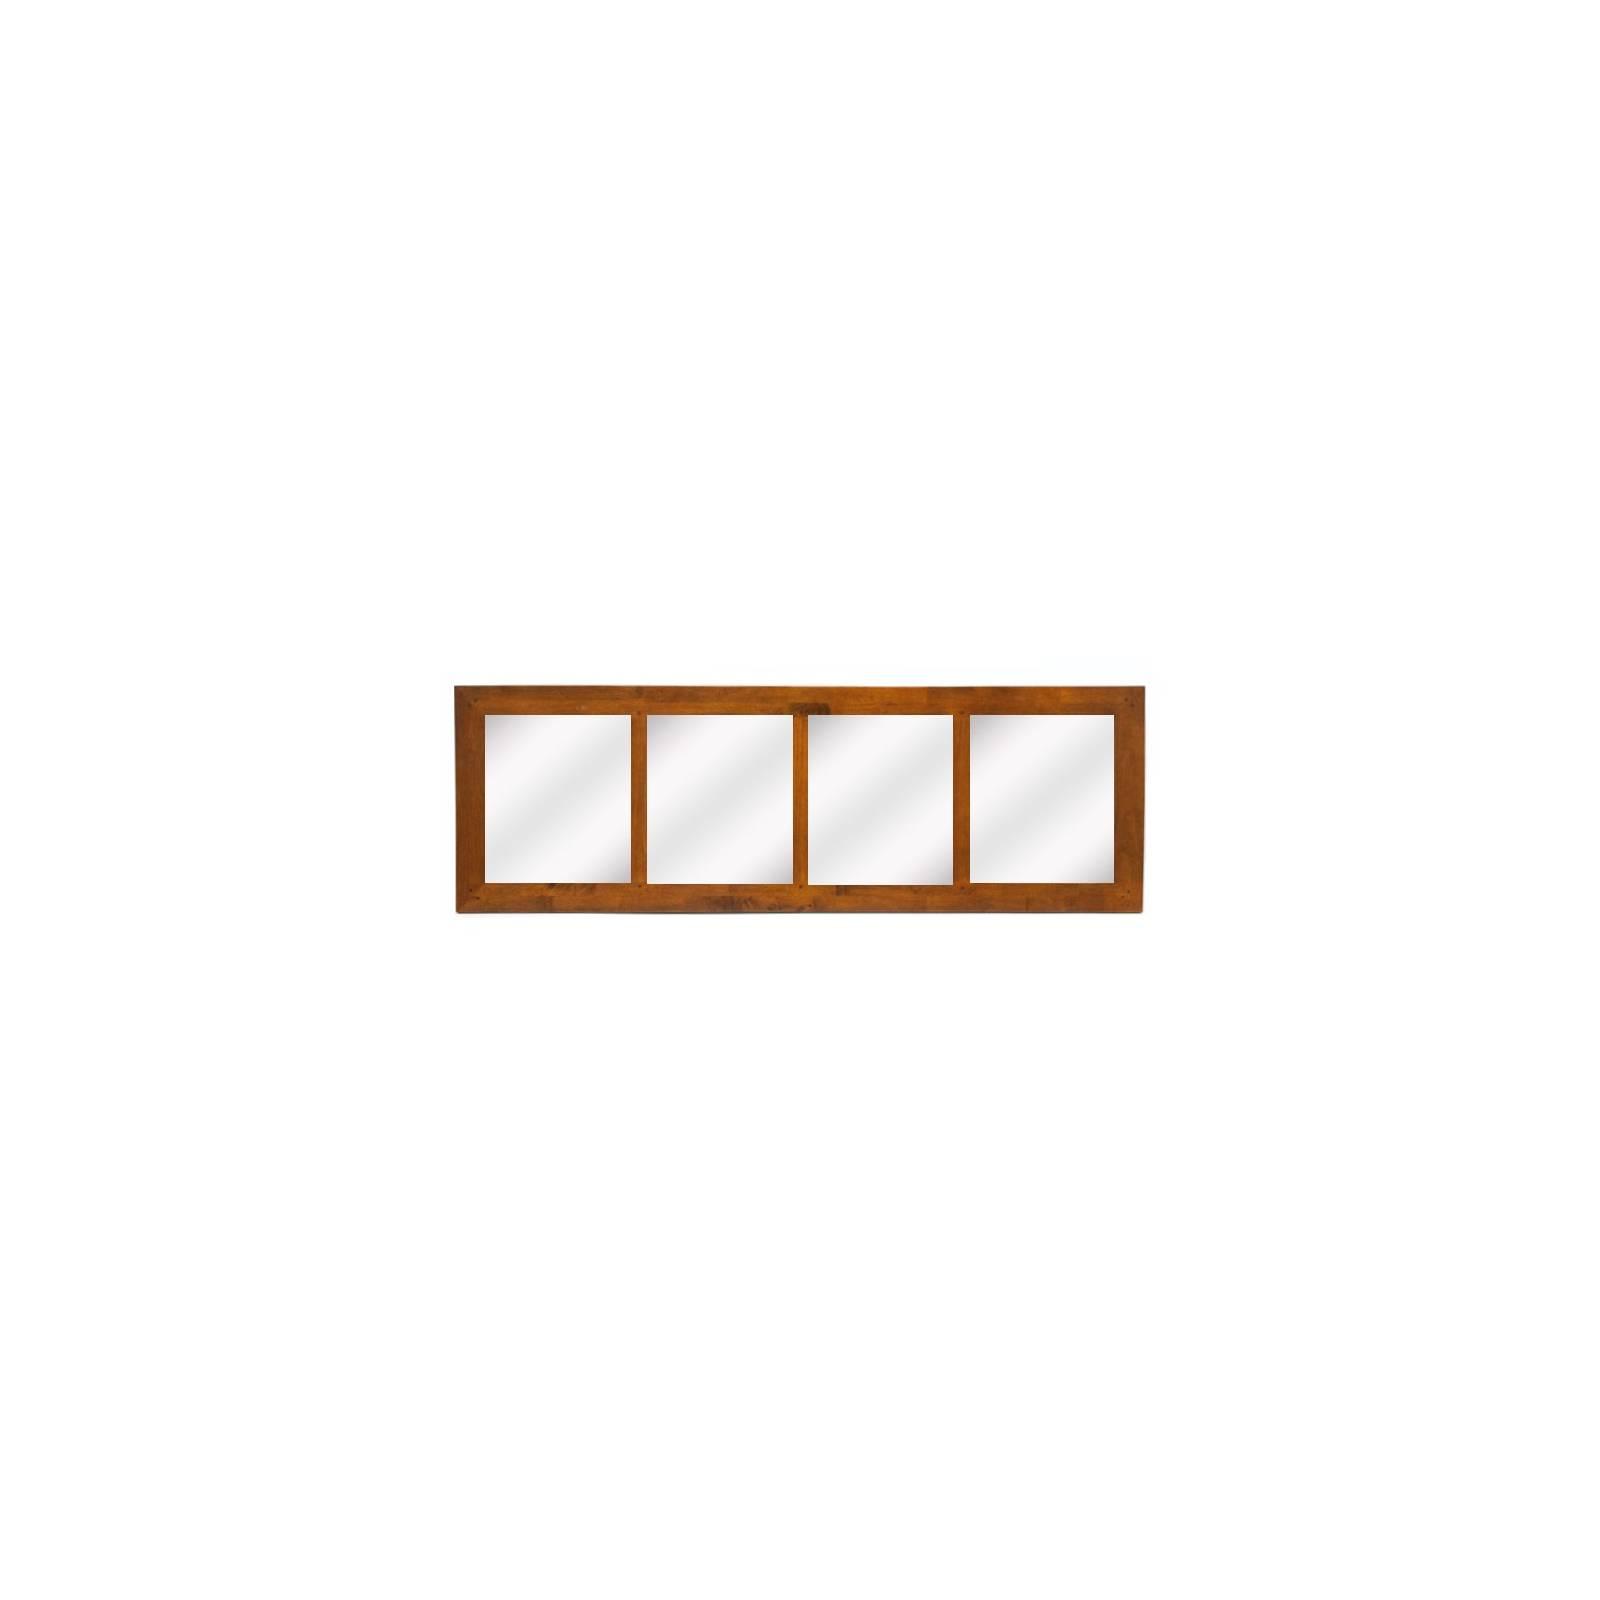 Miroir Tradition Hévéa - meuble style classique